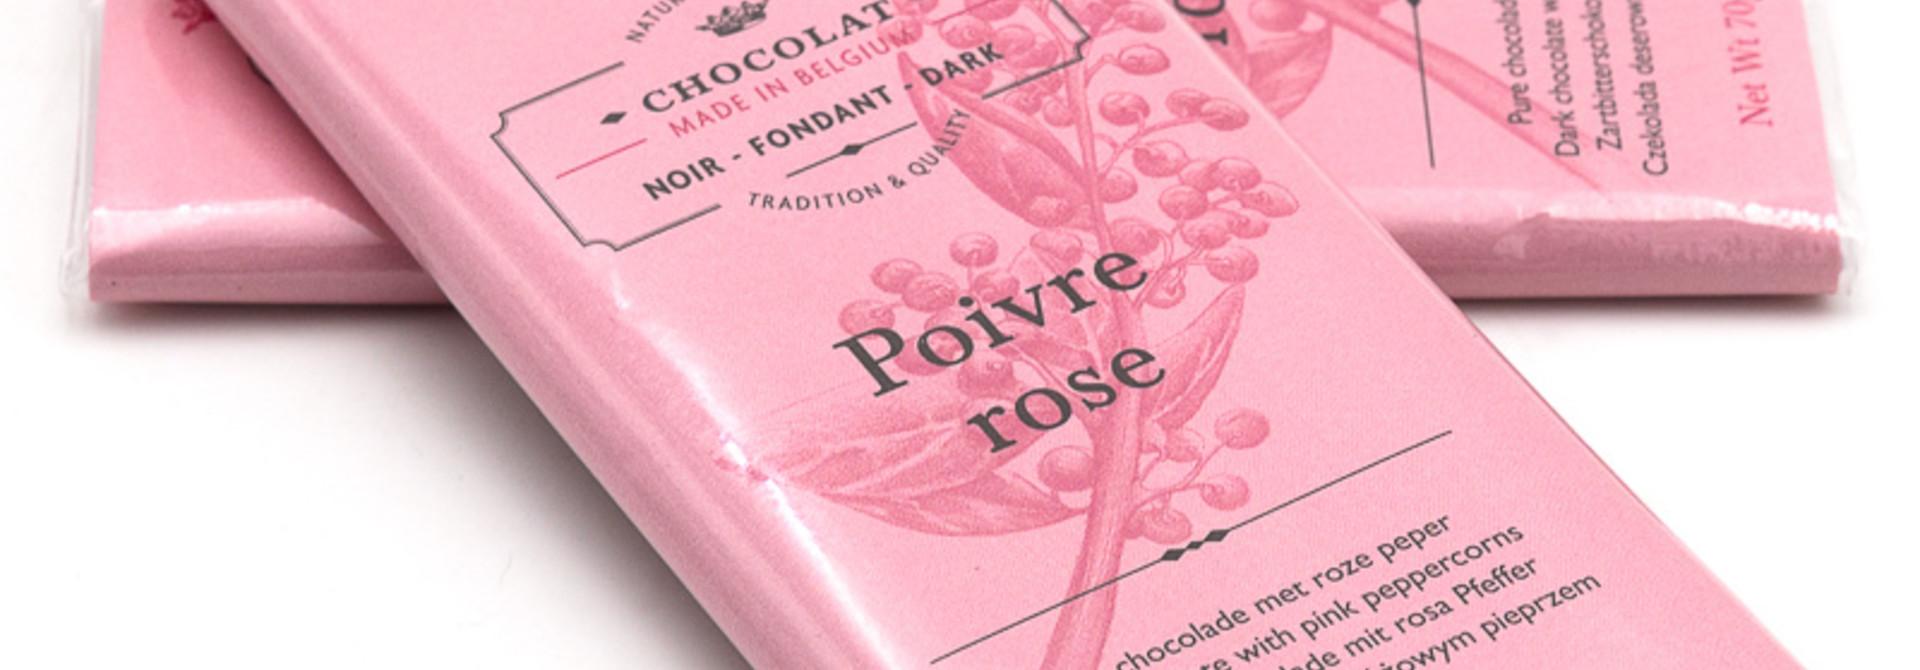 Dolfin dark chocolate 70% (pink peppercorns)